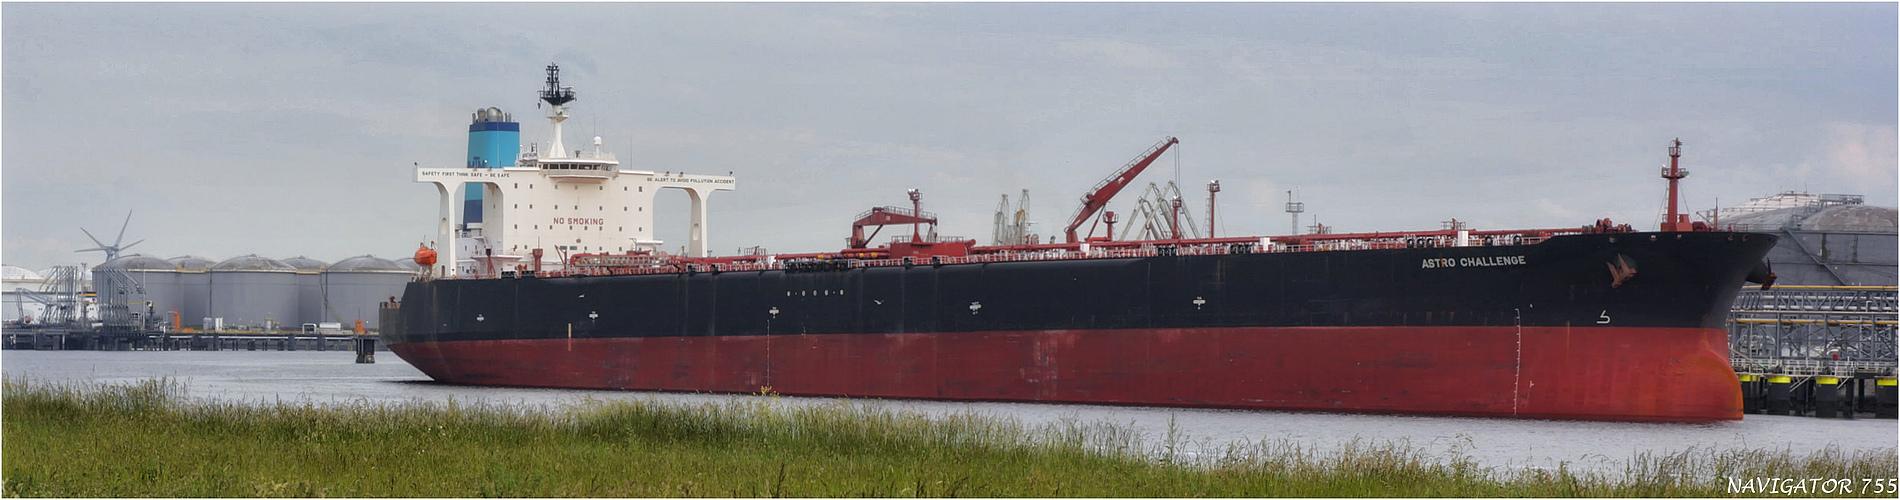 ASTRO CHALLENGE / Crude Oil Tanker / Callandkanal / Rotterdam / Bitte scrollen!